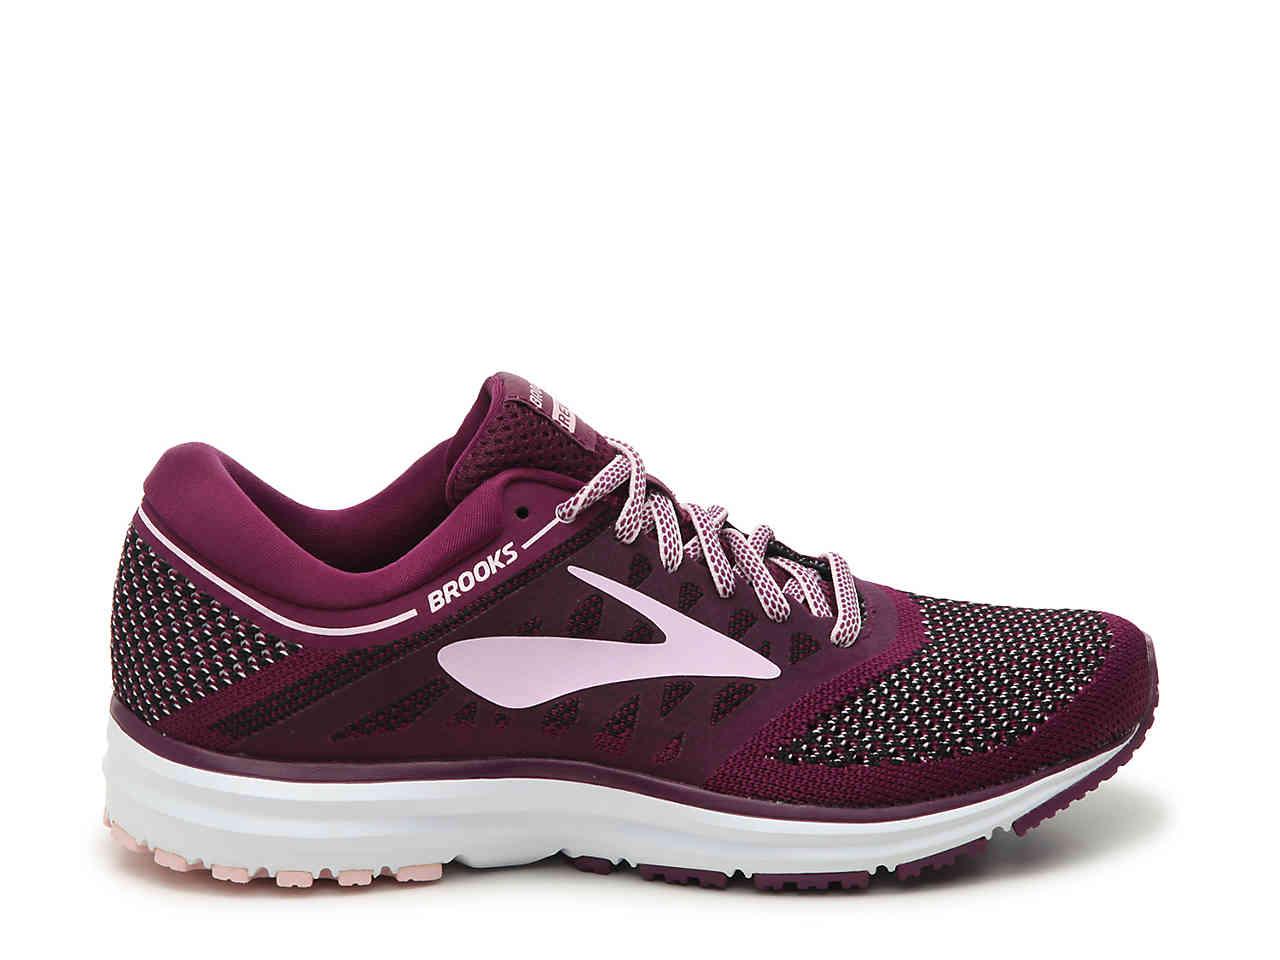 55ff9def1bd4c Brooks Women s Revel 120249-1B-598 – SneakerWorldWide.com